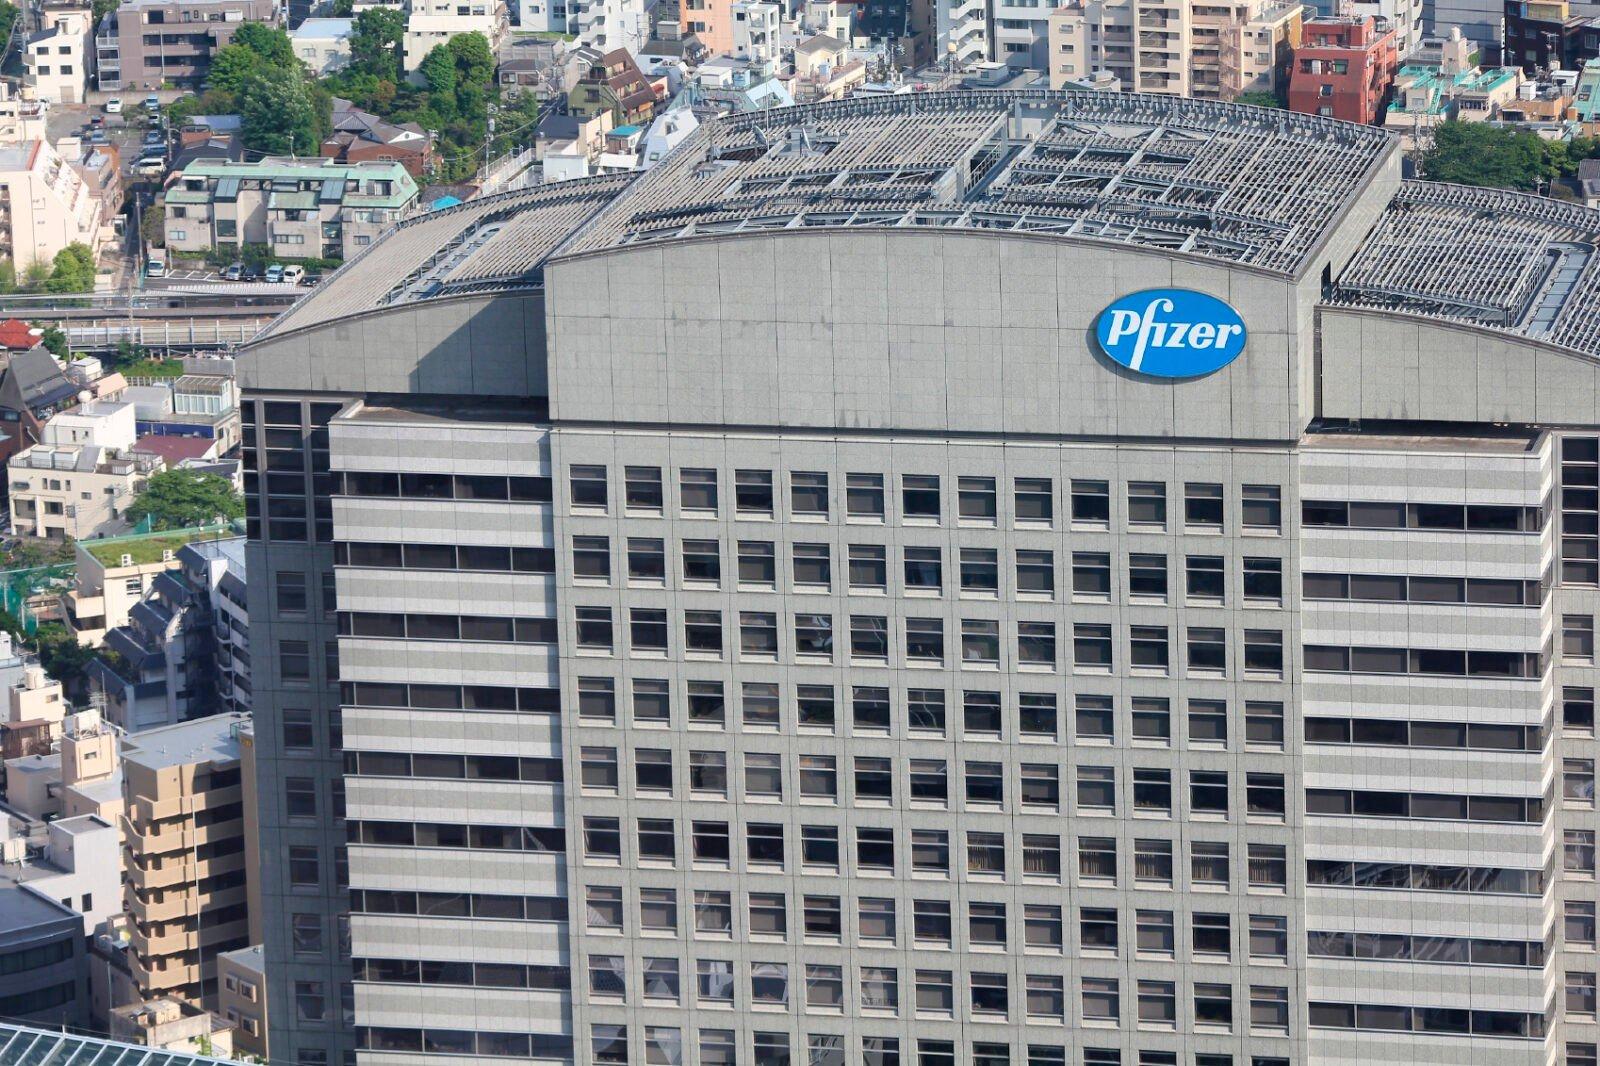 Pfizer Tokyo Office